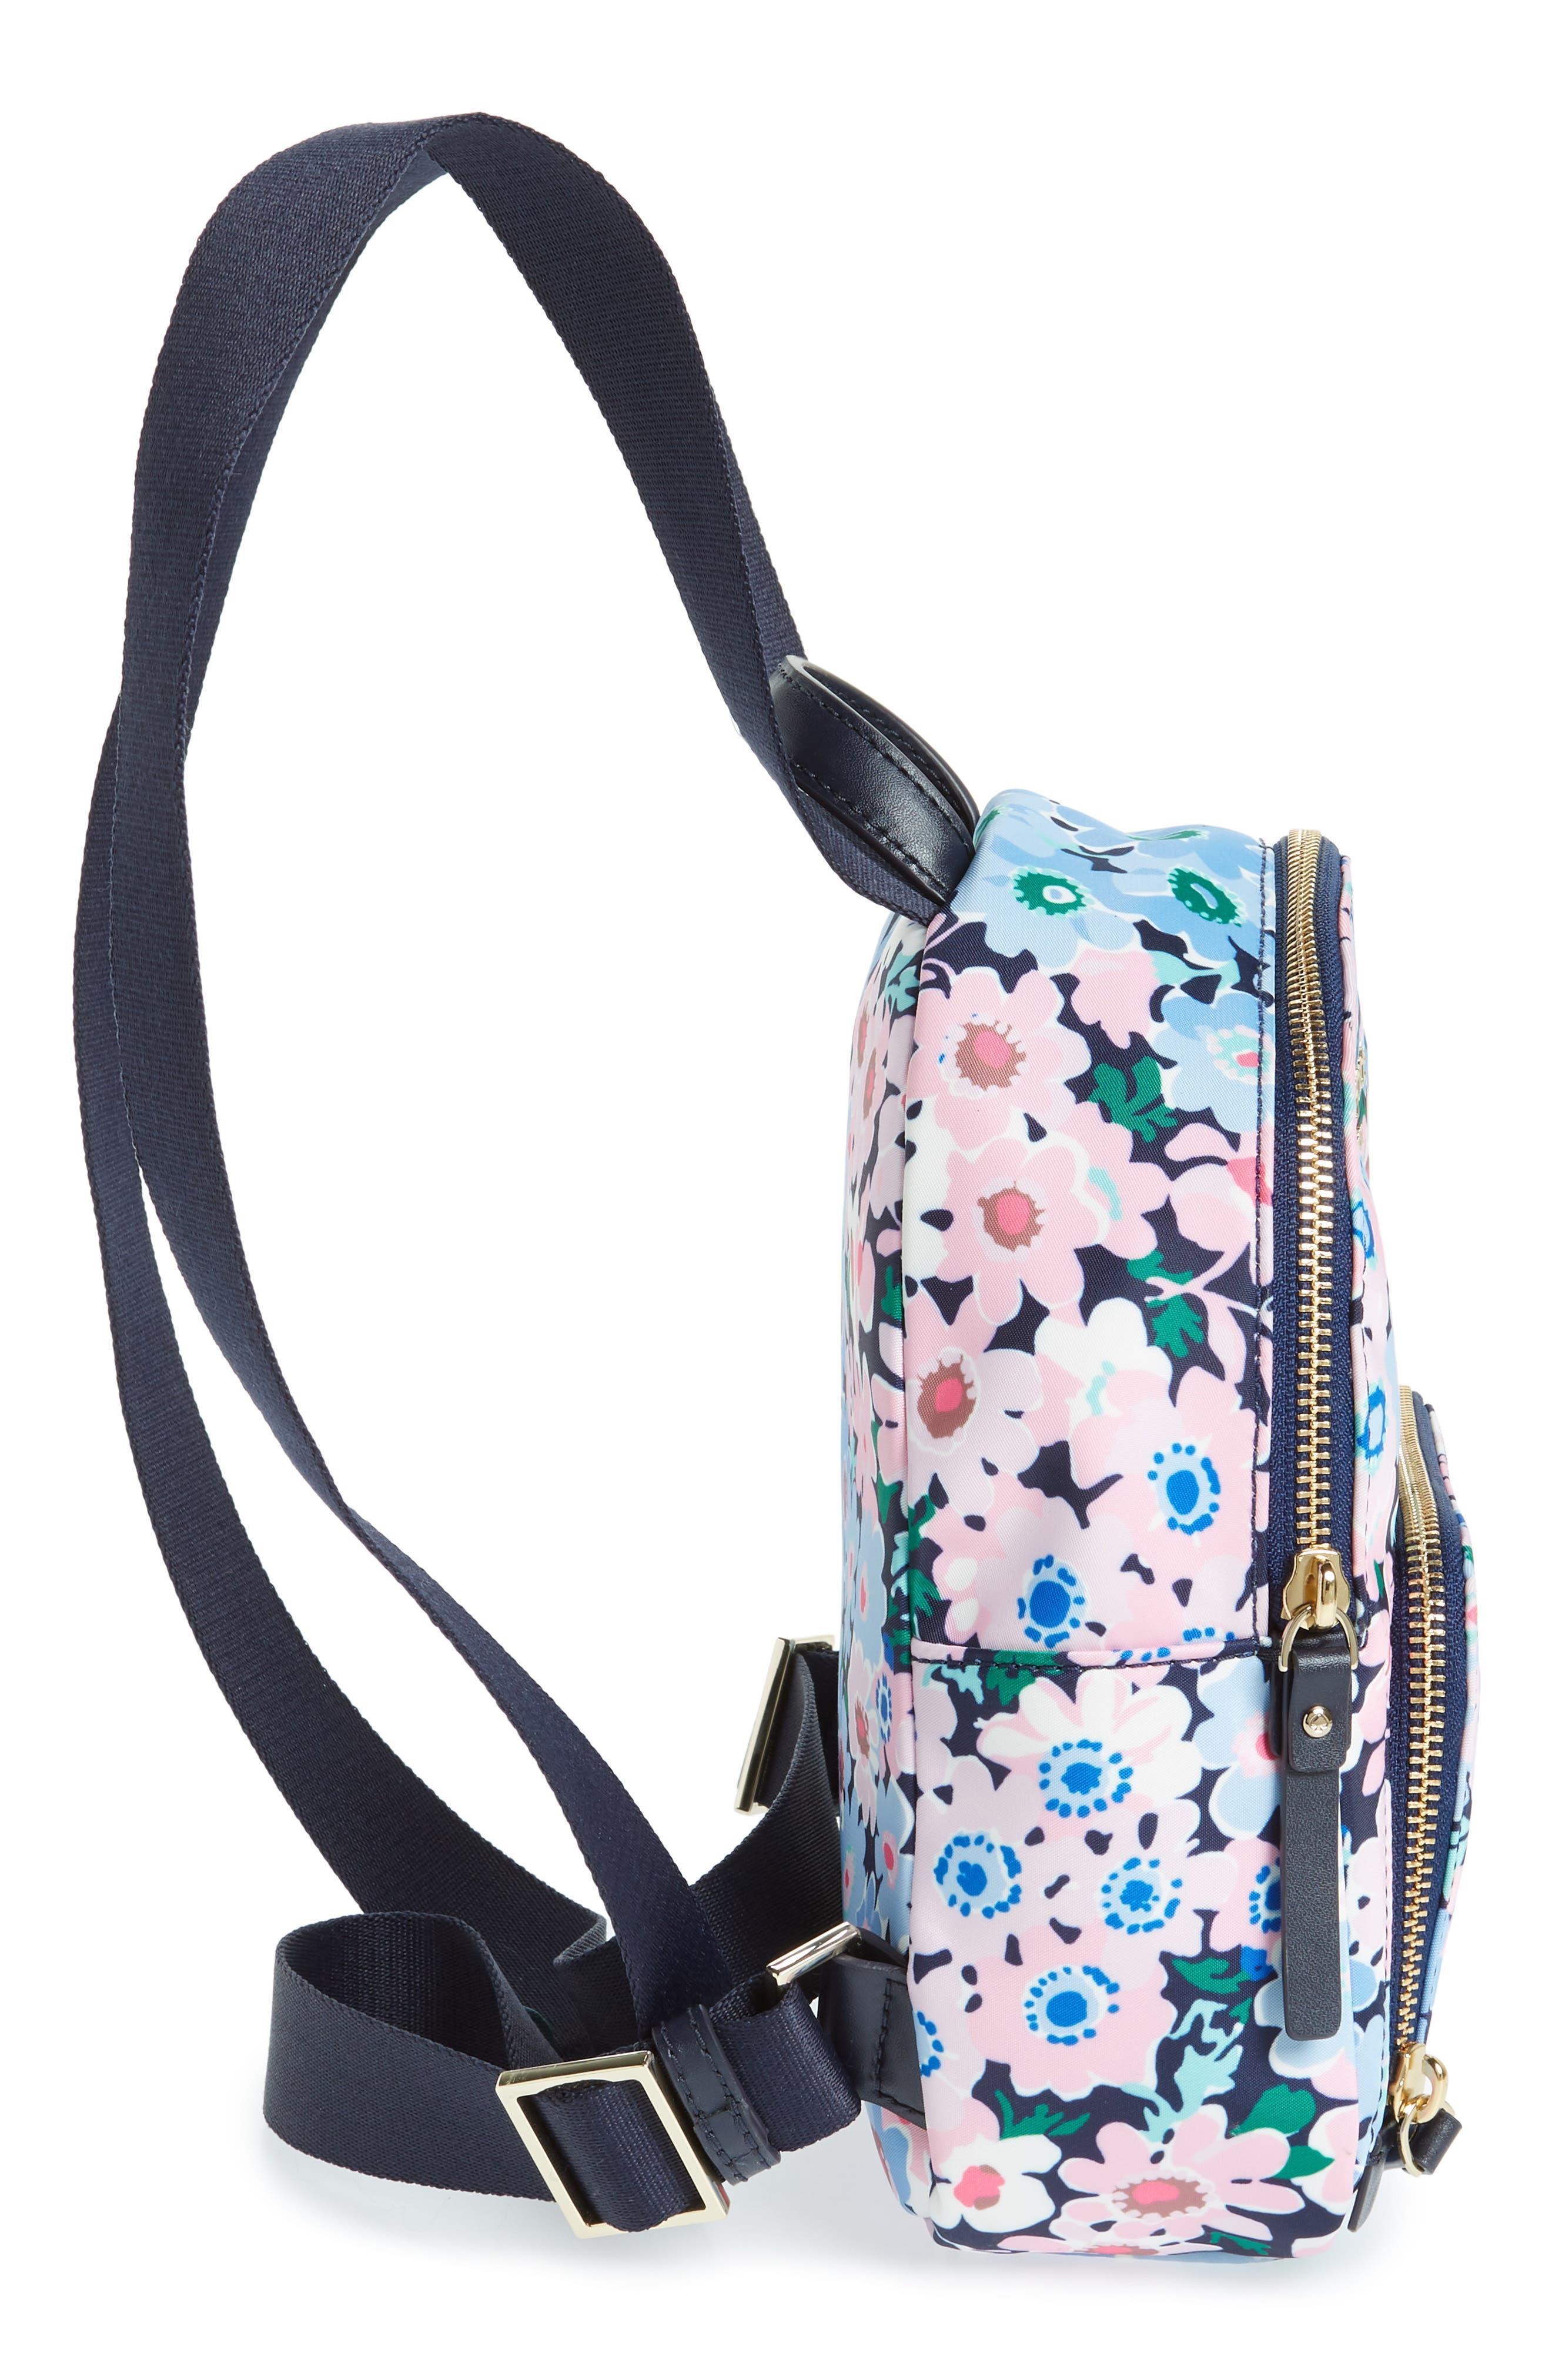 watson lane - daisy garden small hartley backpack,                             Alternate thumbnail 5, color,                             400